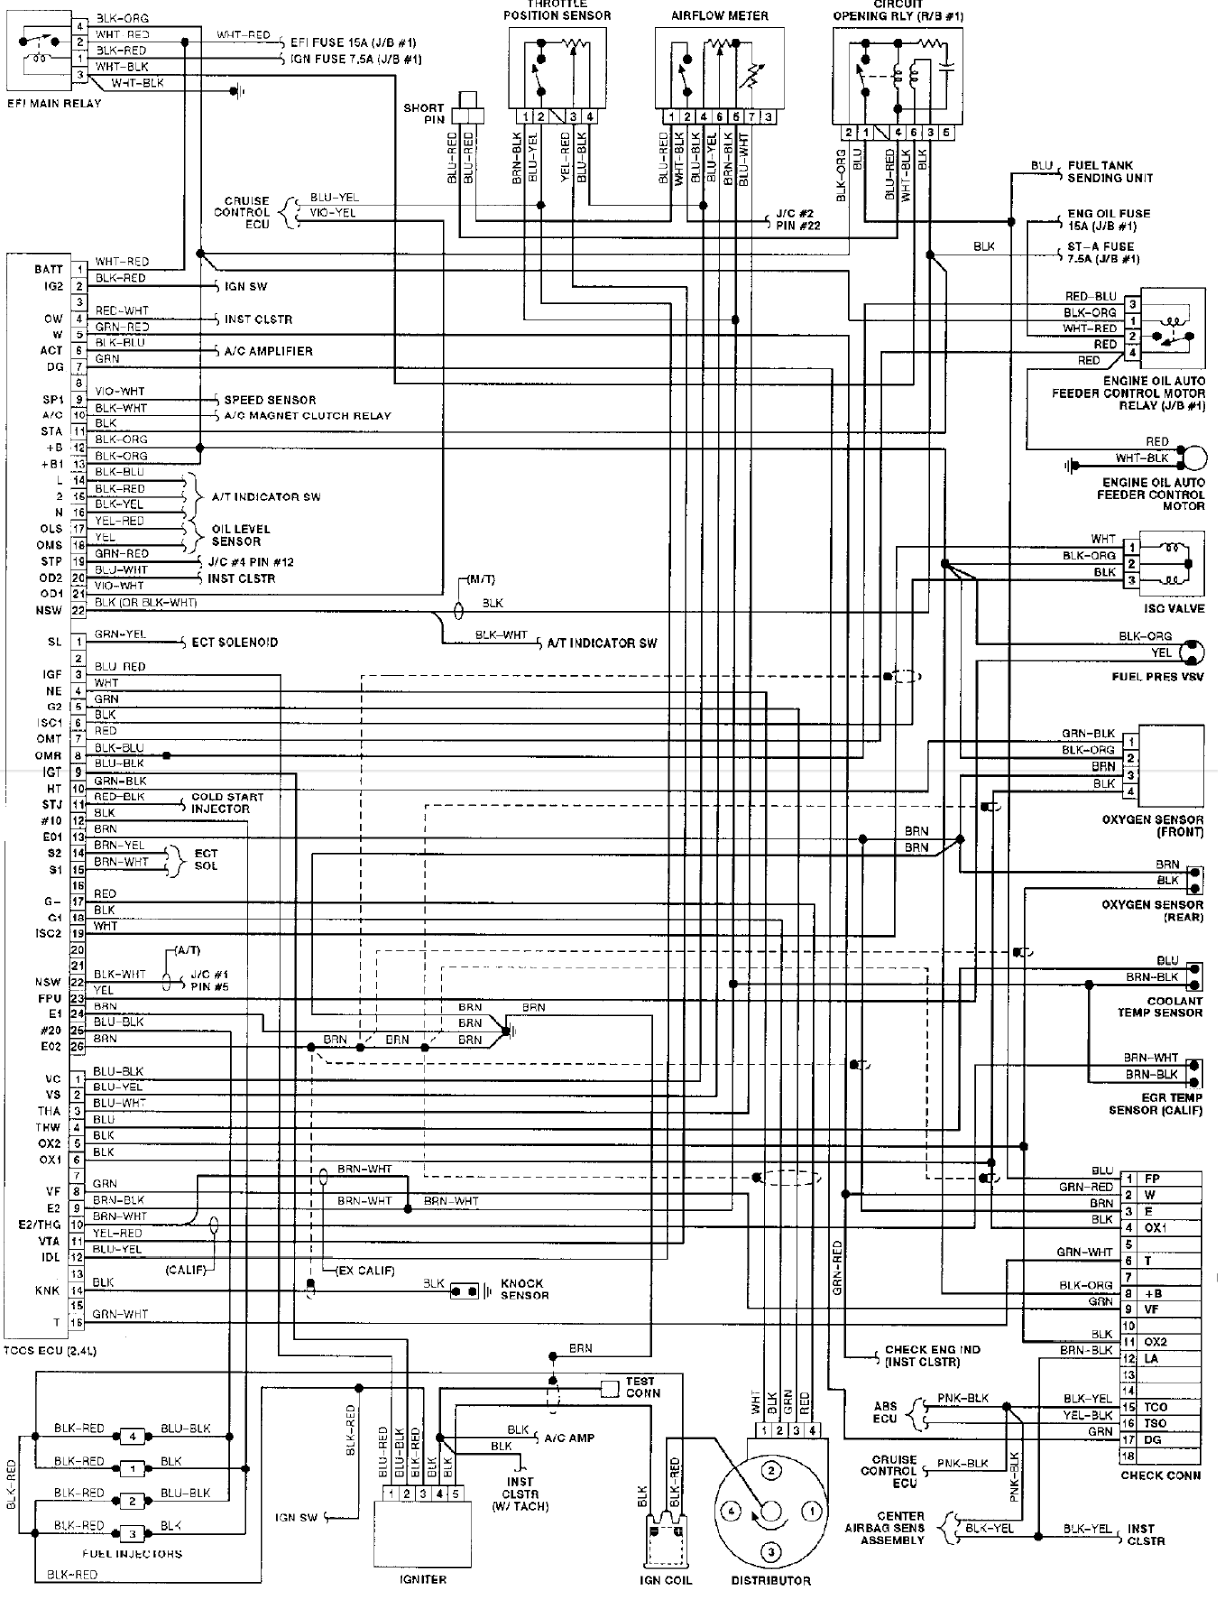 medium resolution of wiring diagram for gear vendors overdrive 67 nova dash gear vendors electronics gear vendors oil